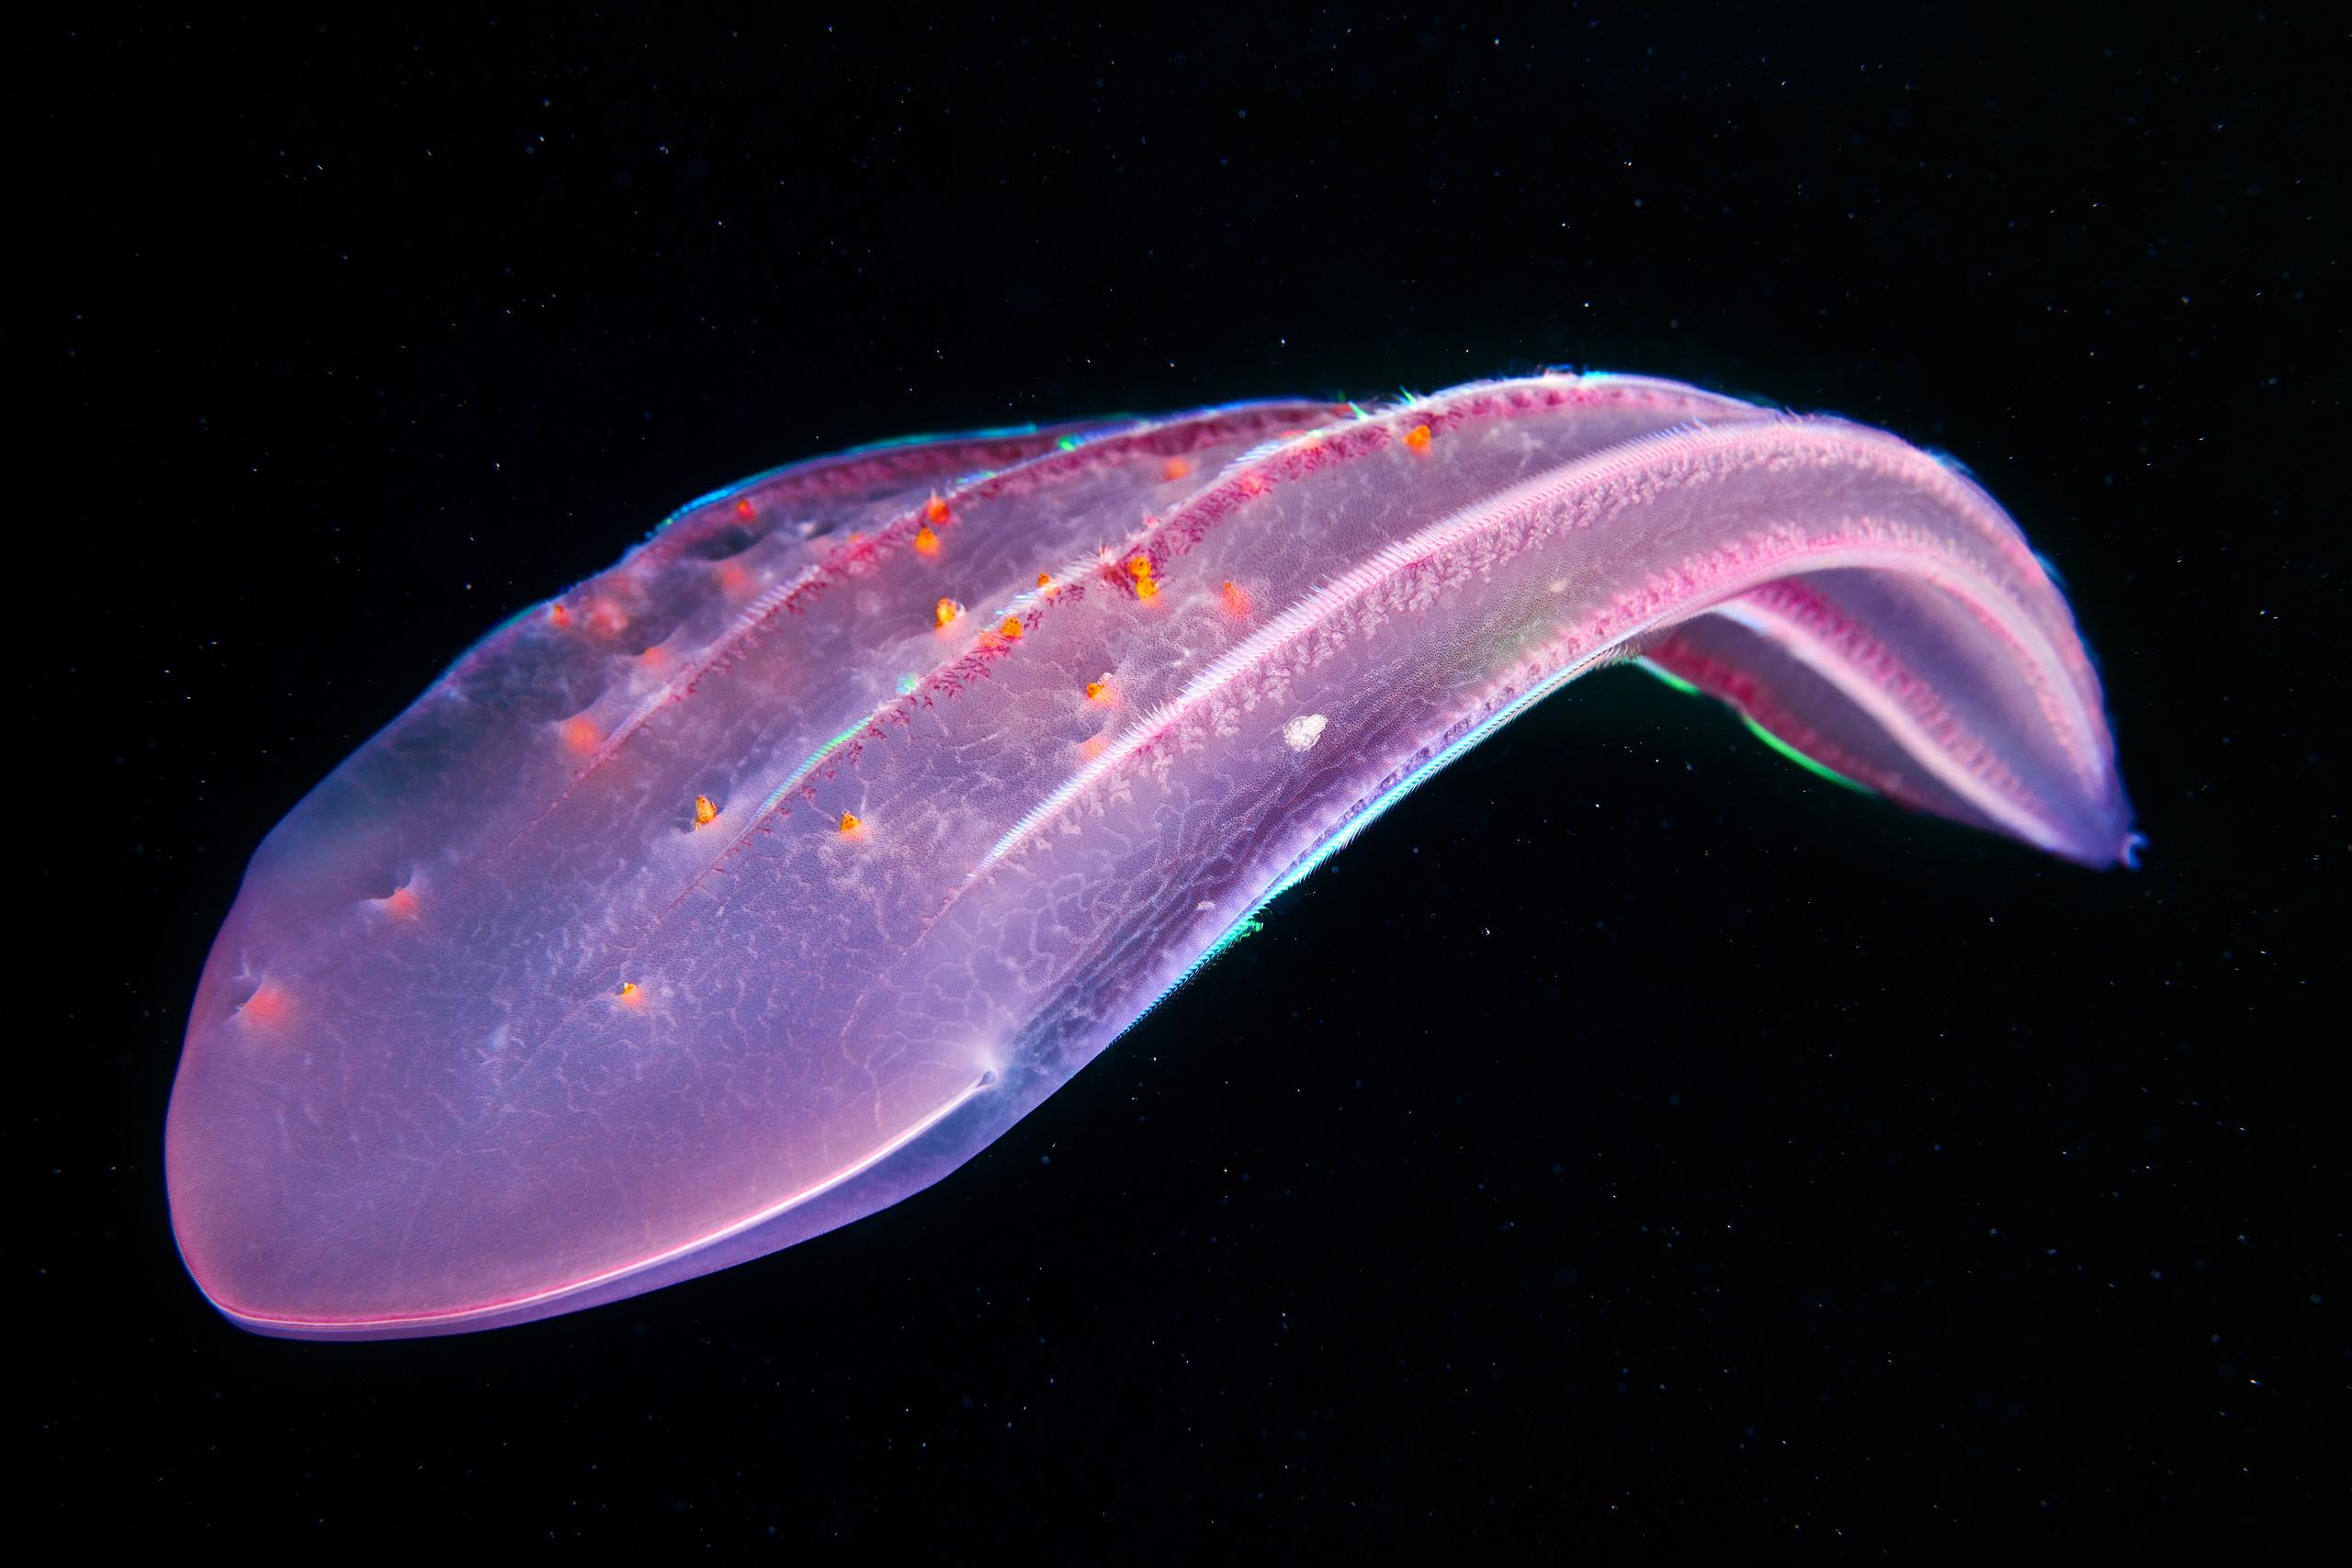 Ctenophora – Beroe forskalii with hyperiids 02